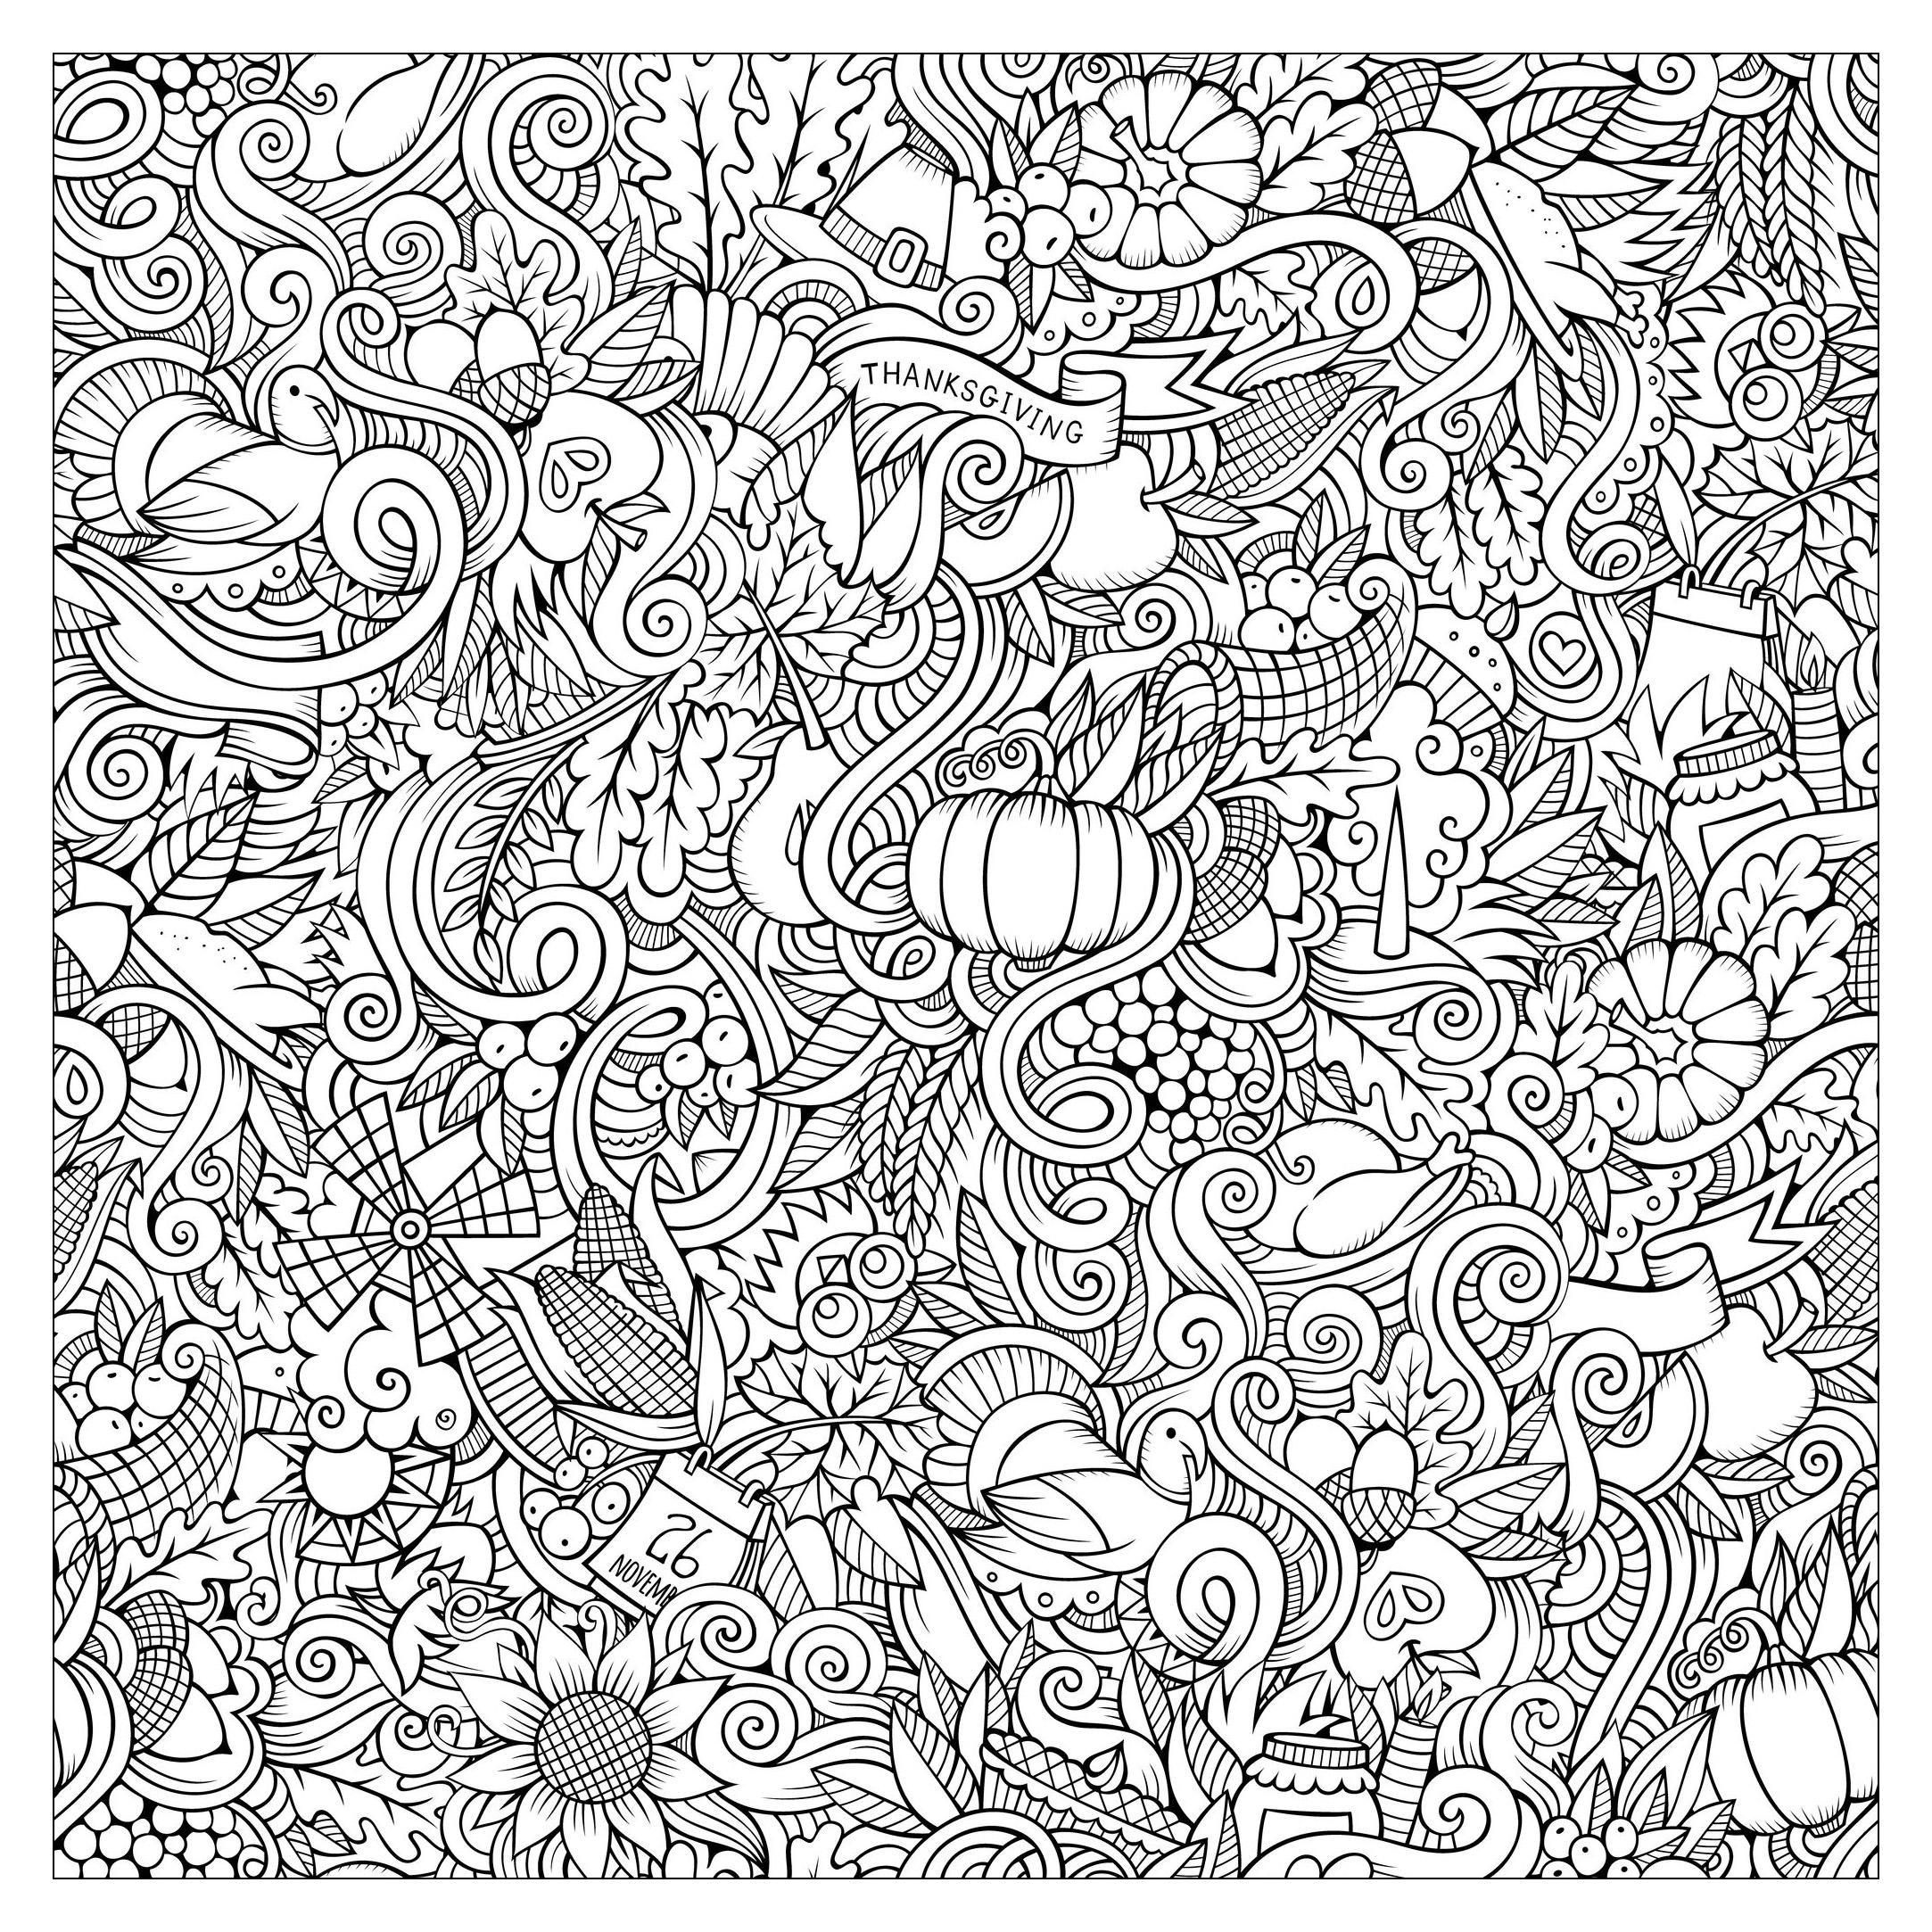 Cartoon Vector Hand Drawn Doodles Thanksgiving Autumn